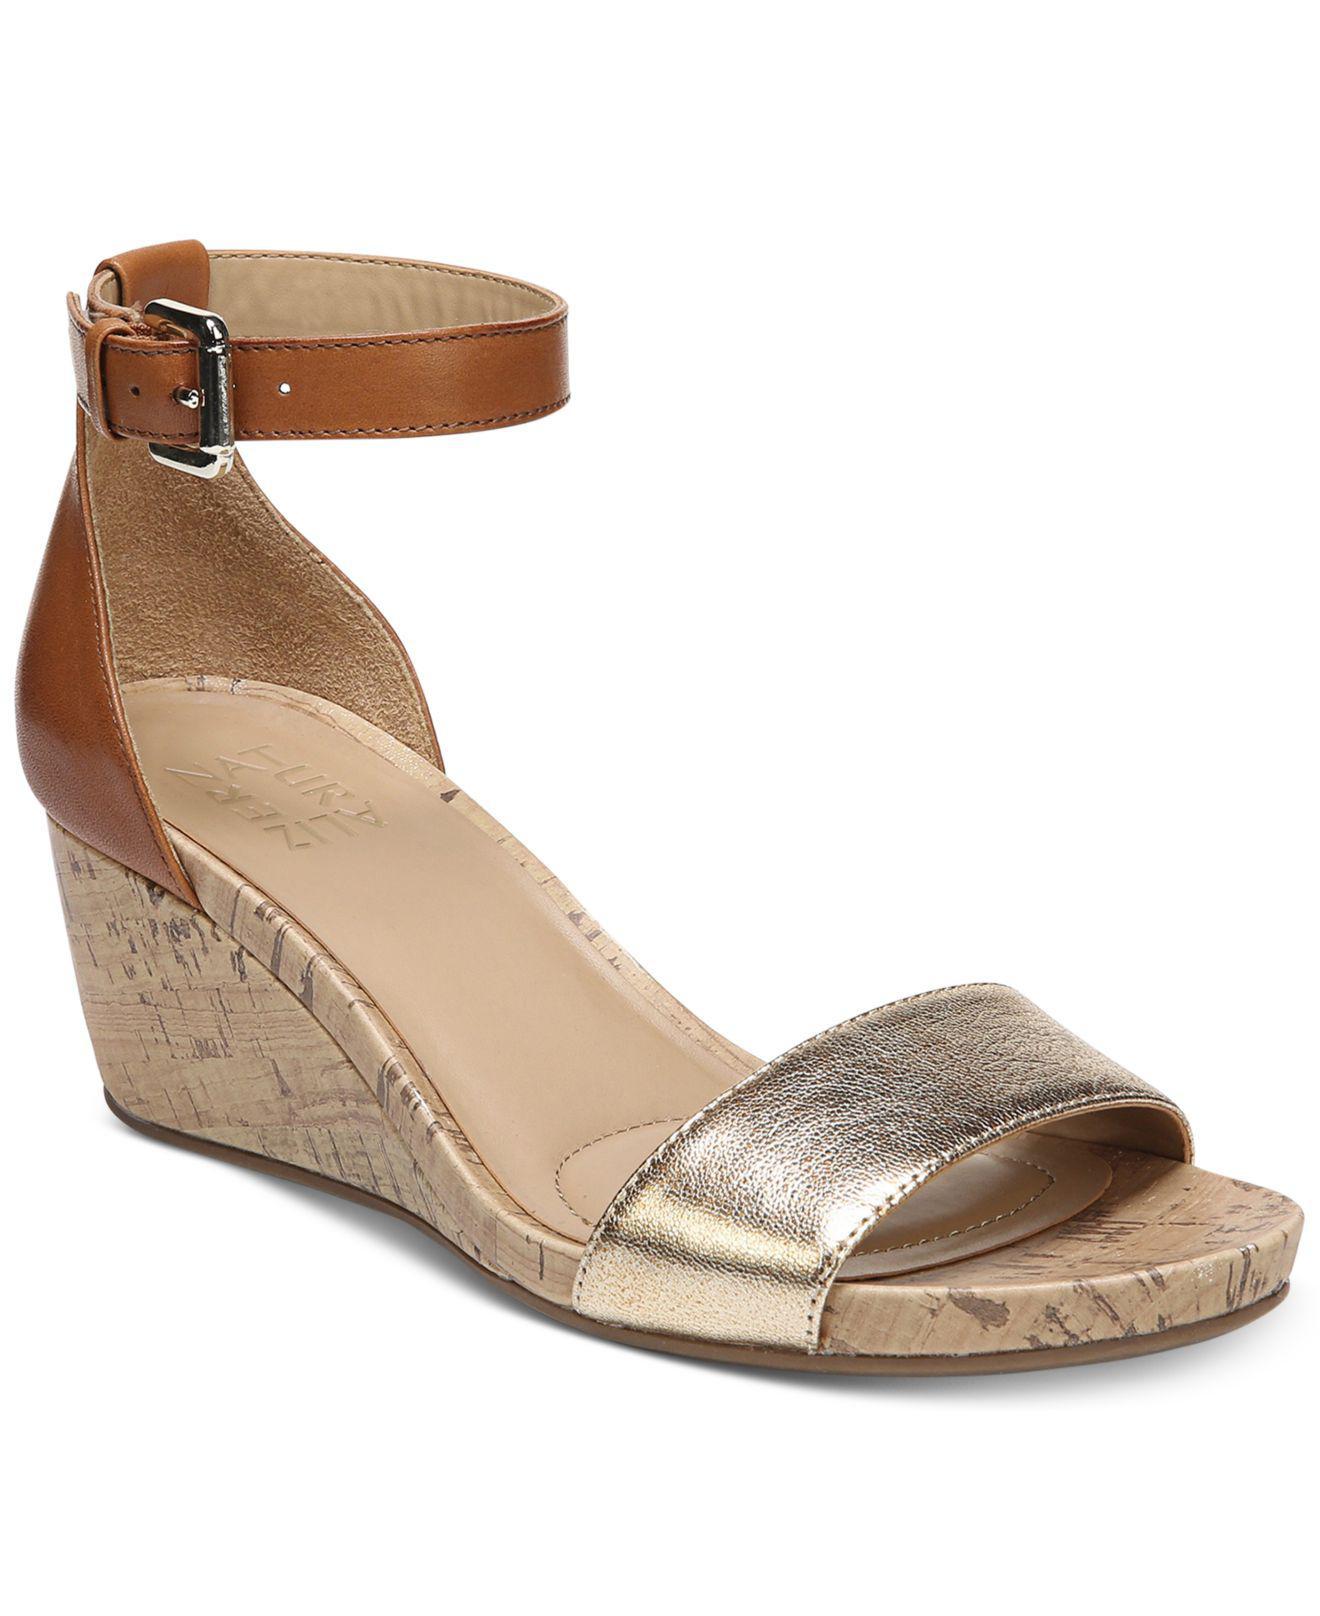 1903ac092bae Lyst - Naturalizer Cami Wedge Sandals